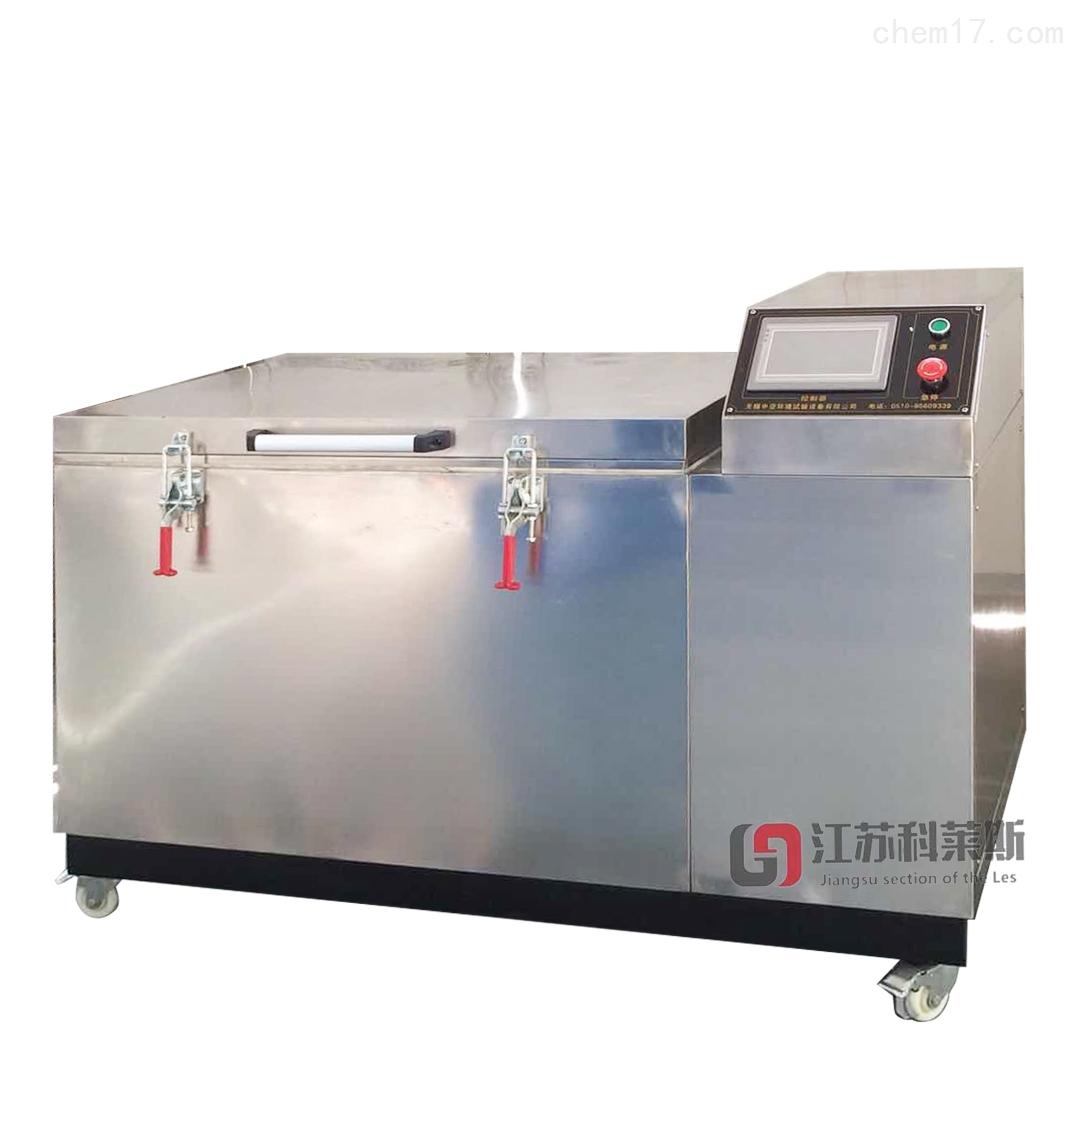 kls-005液氮深冷處理箱